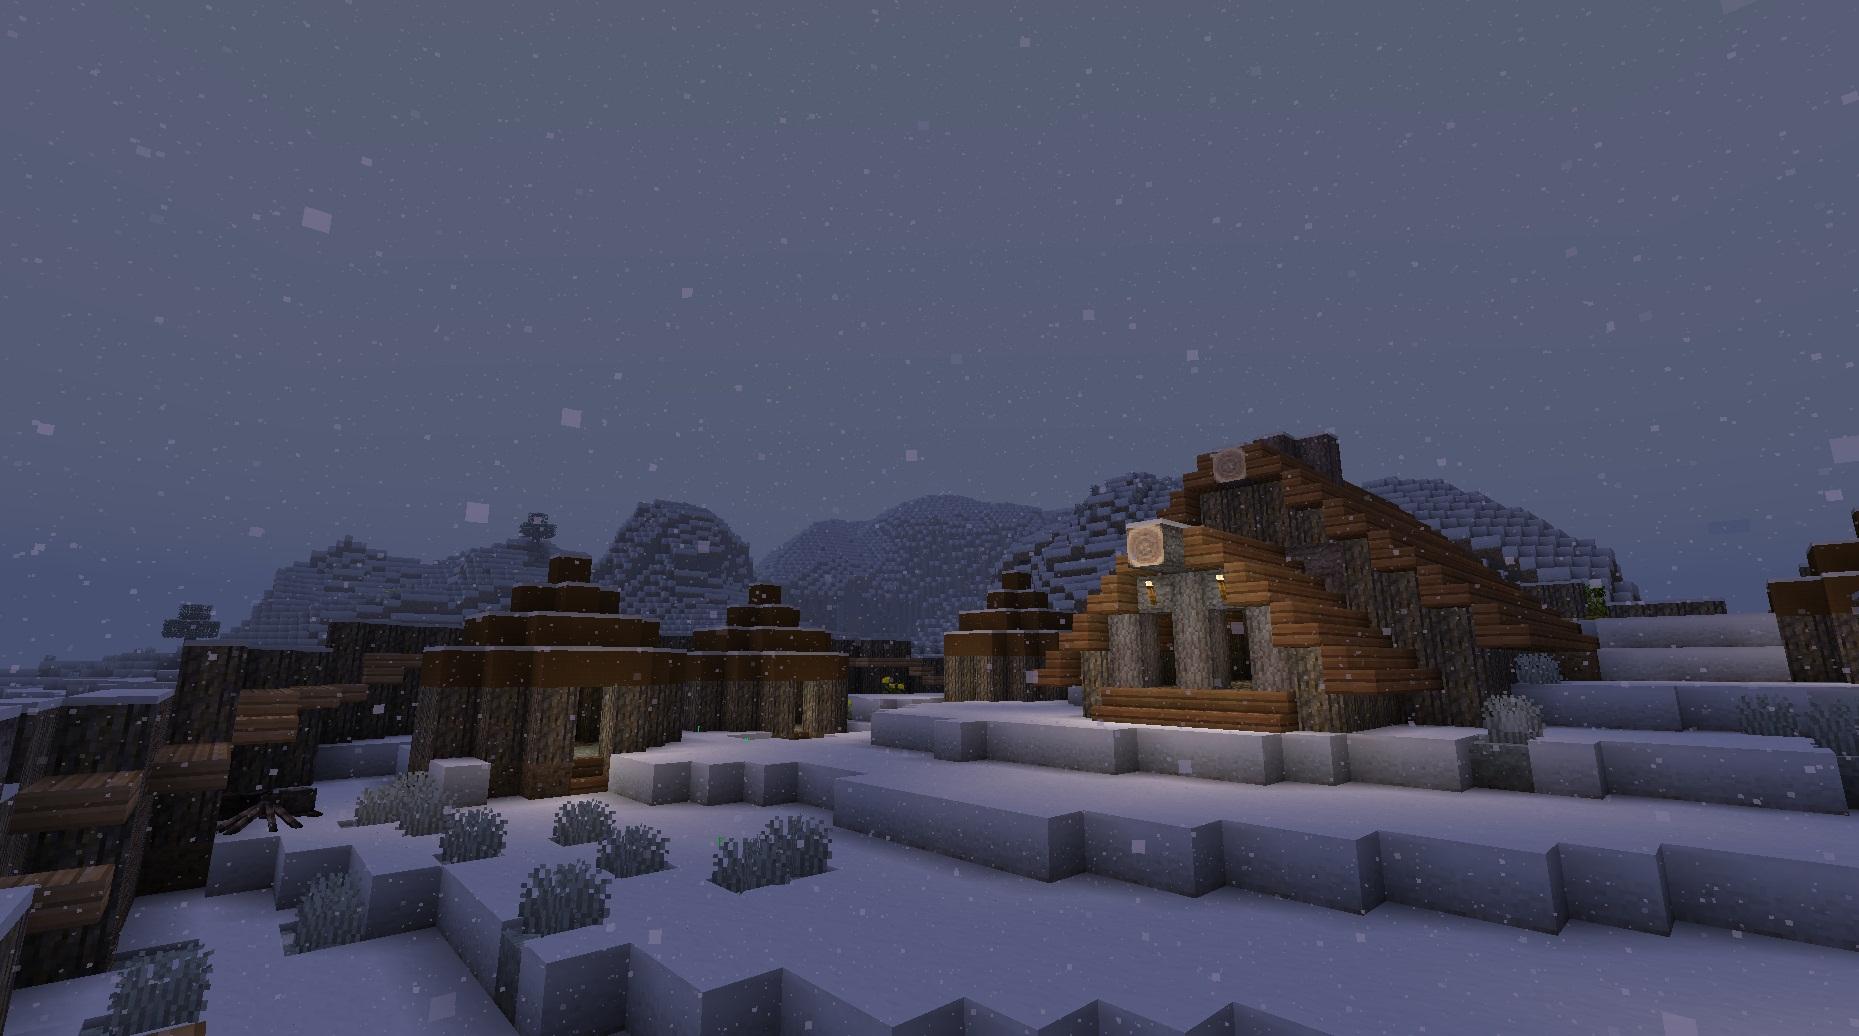 http://planetaminecraft.com/wp-content/uploads/2012/12/210dd__Pixel-Reality-Texture-Pack-3.jpg